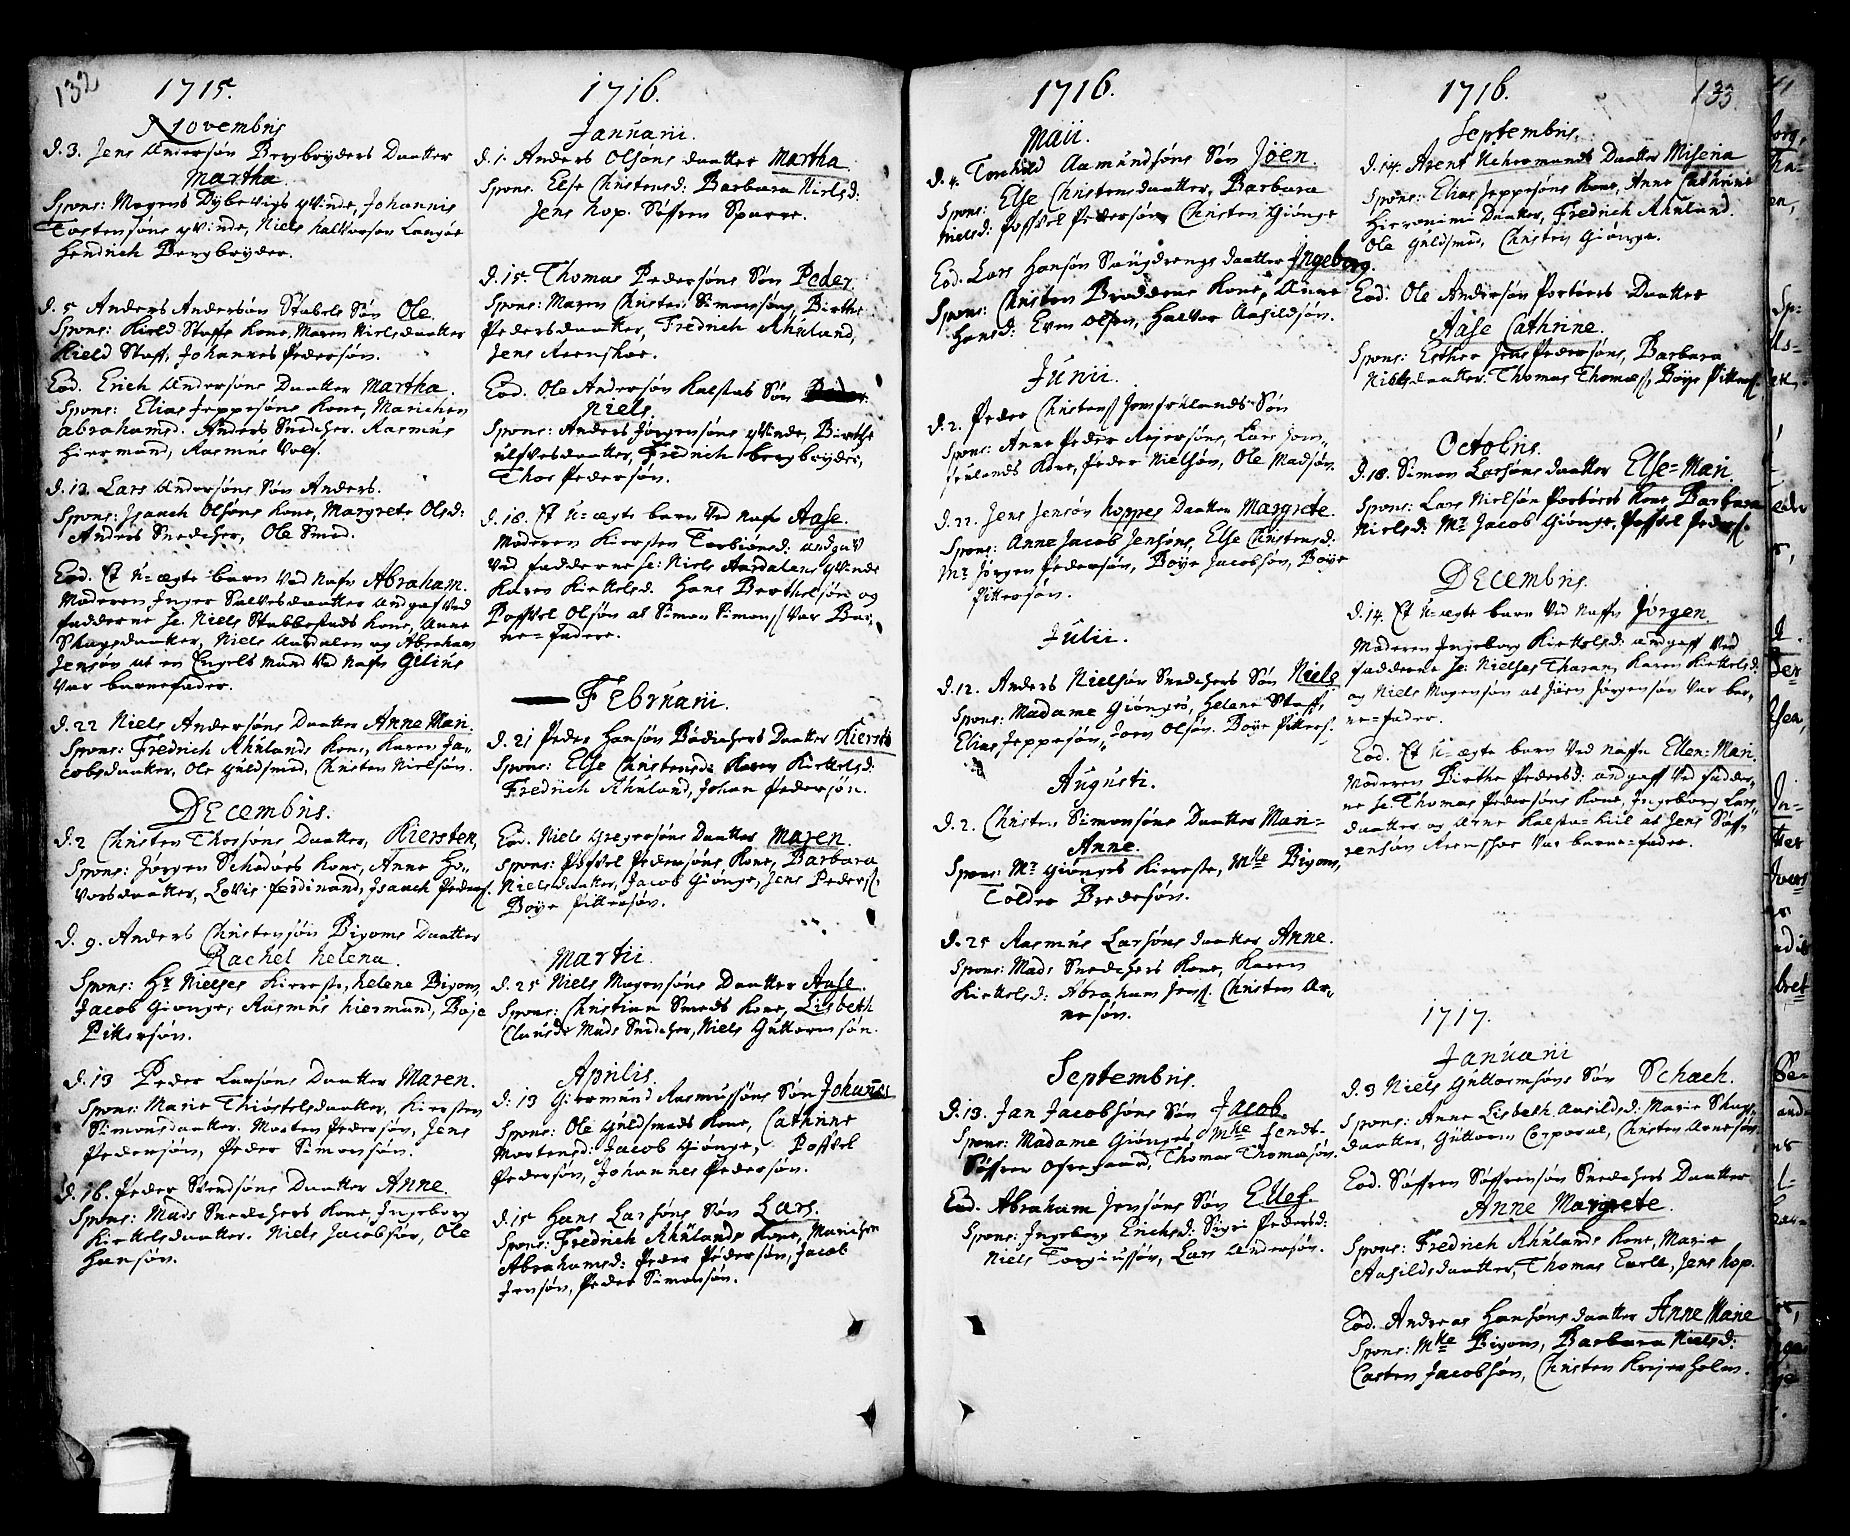 SAKO, Kragerø kirkebøker, F/Fa/L0001: Ministerialbok nr. 1, 1702-1766, s. 132-133